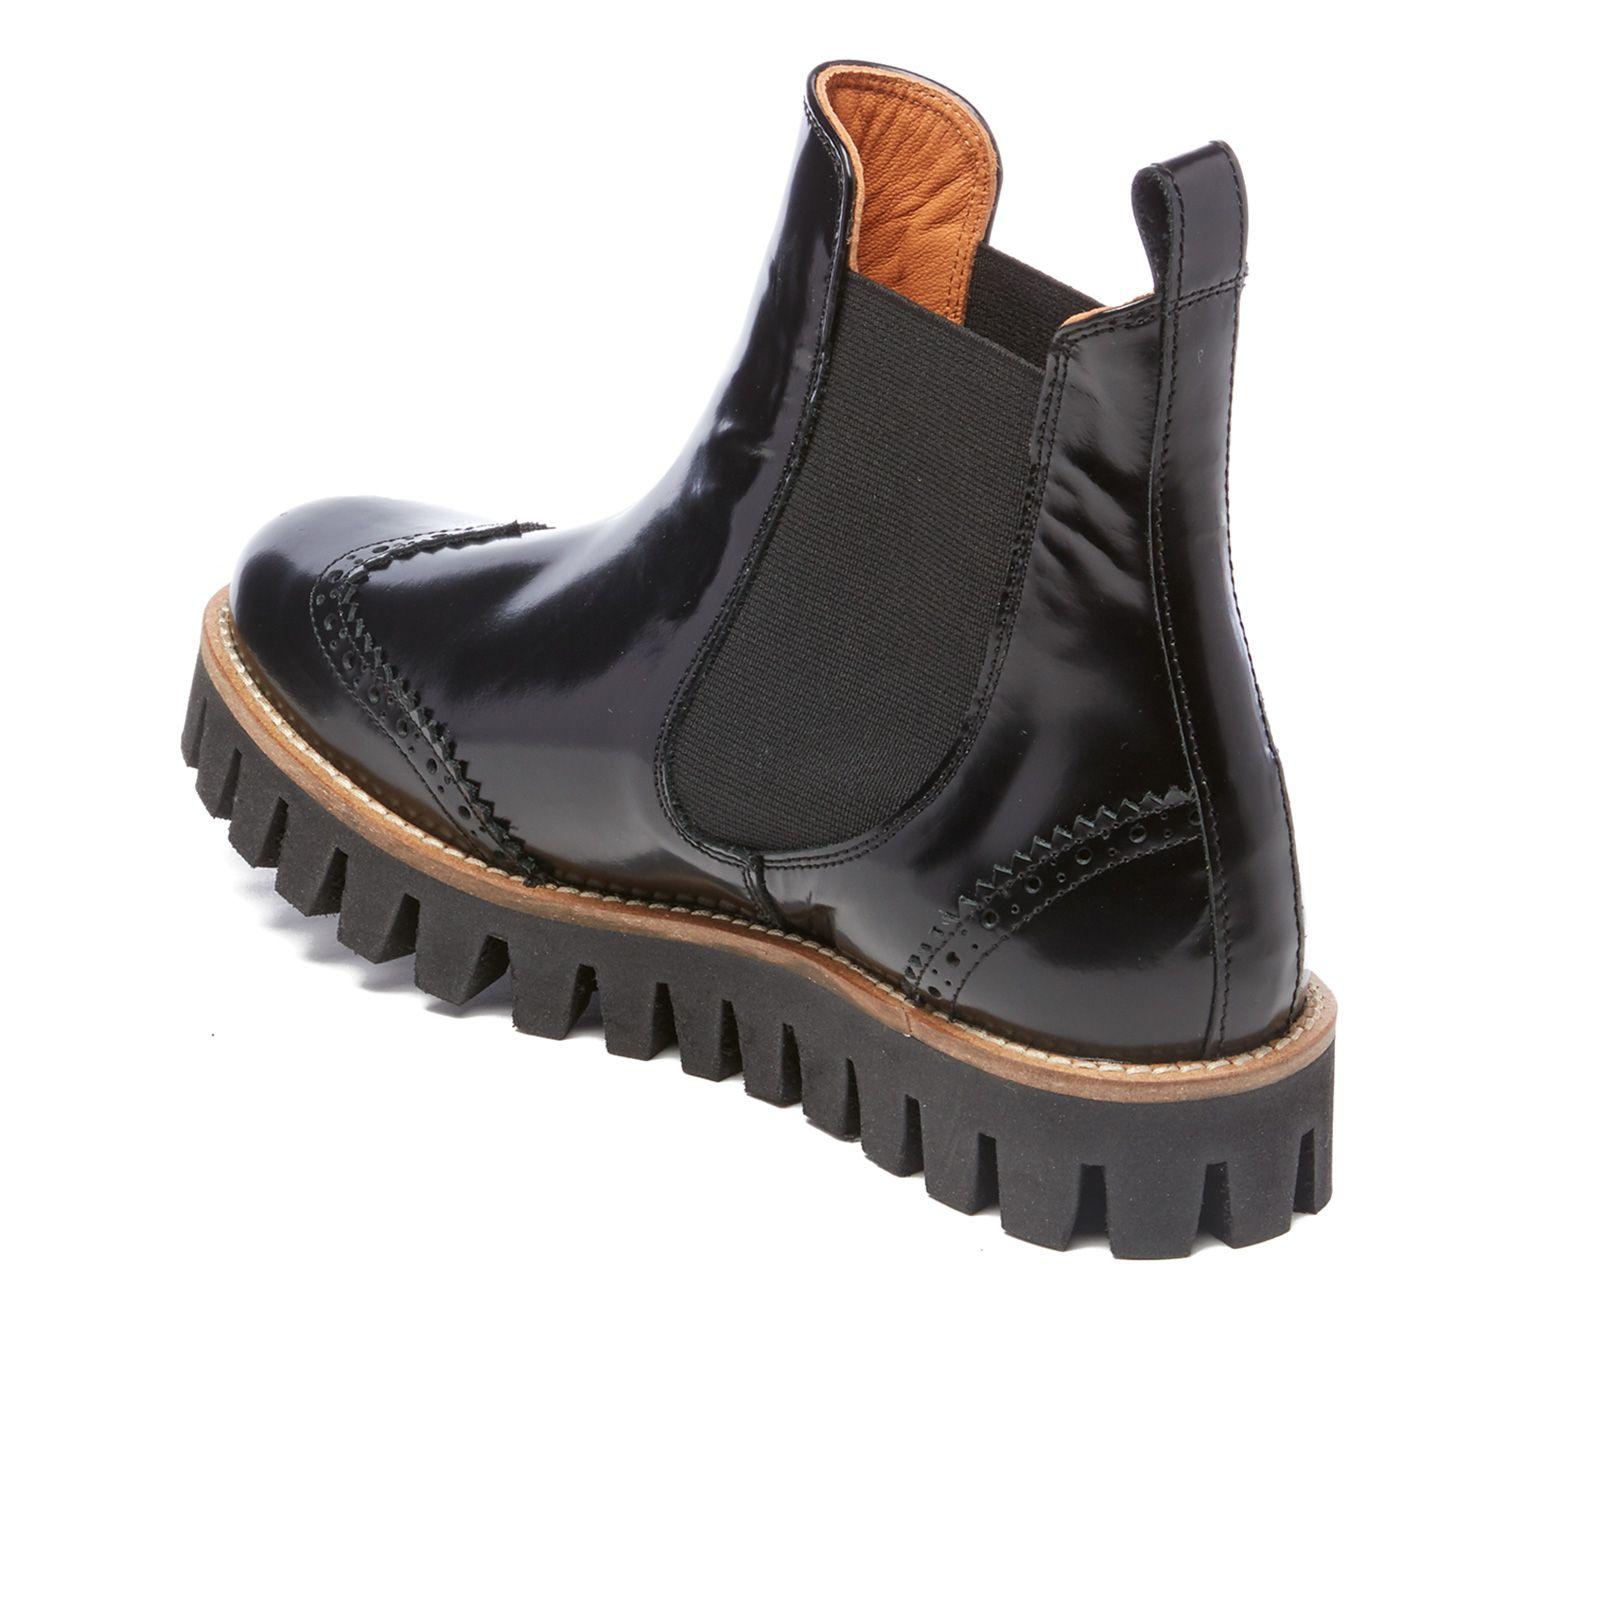 Free Ganni Black Boots Clothing UK Chunky Women's Erin Shine kOPiuXZ